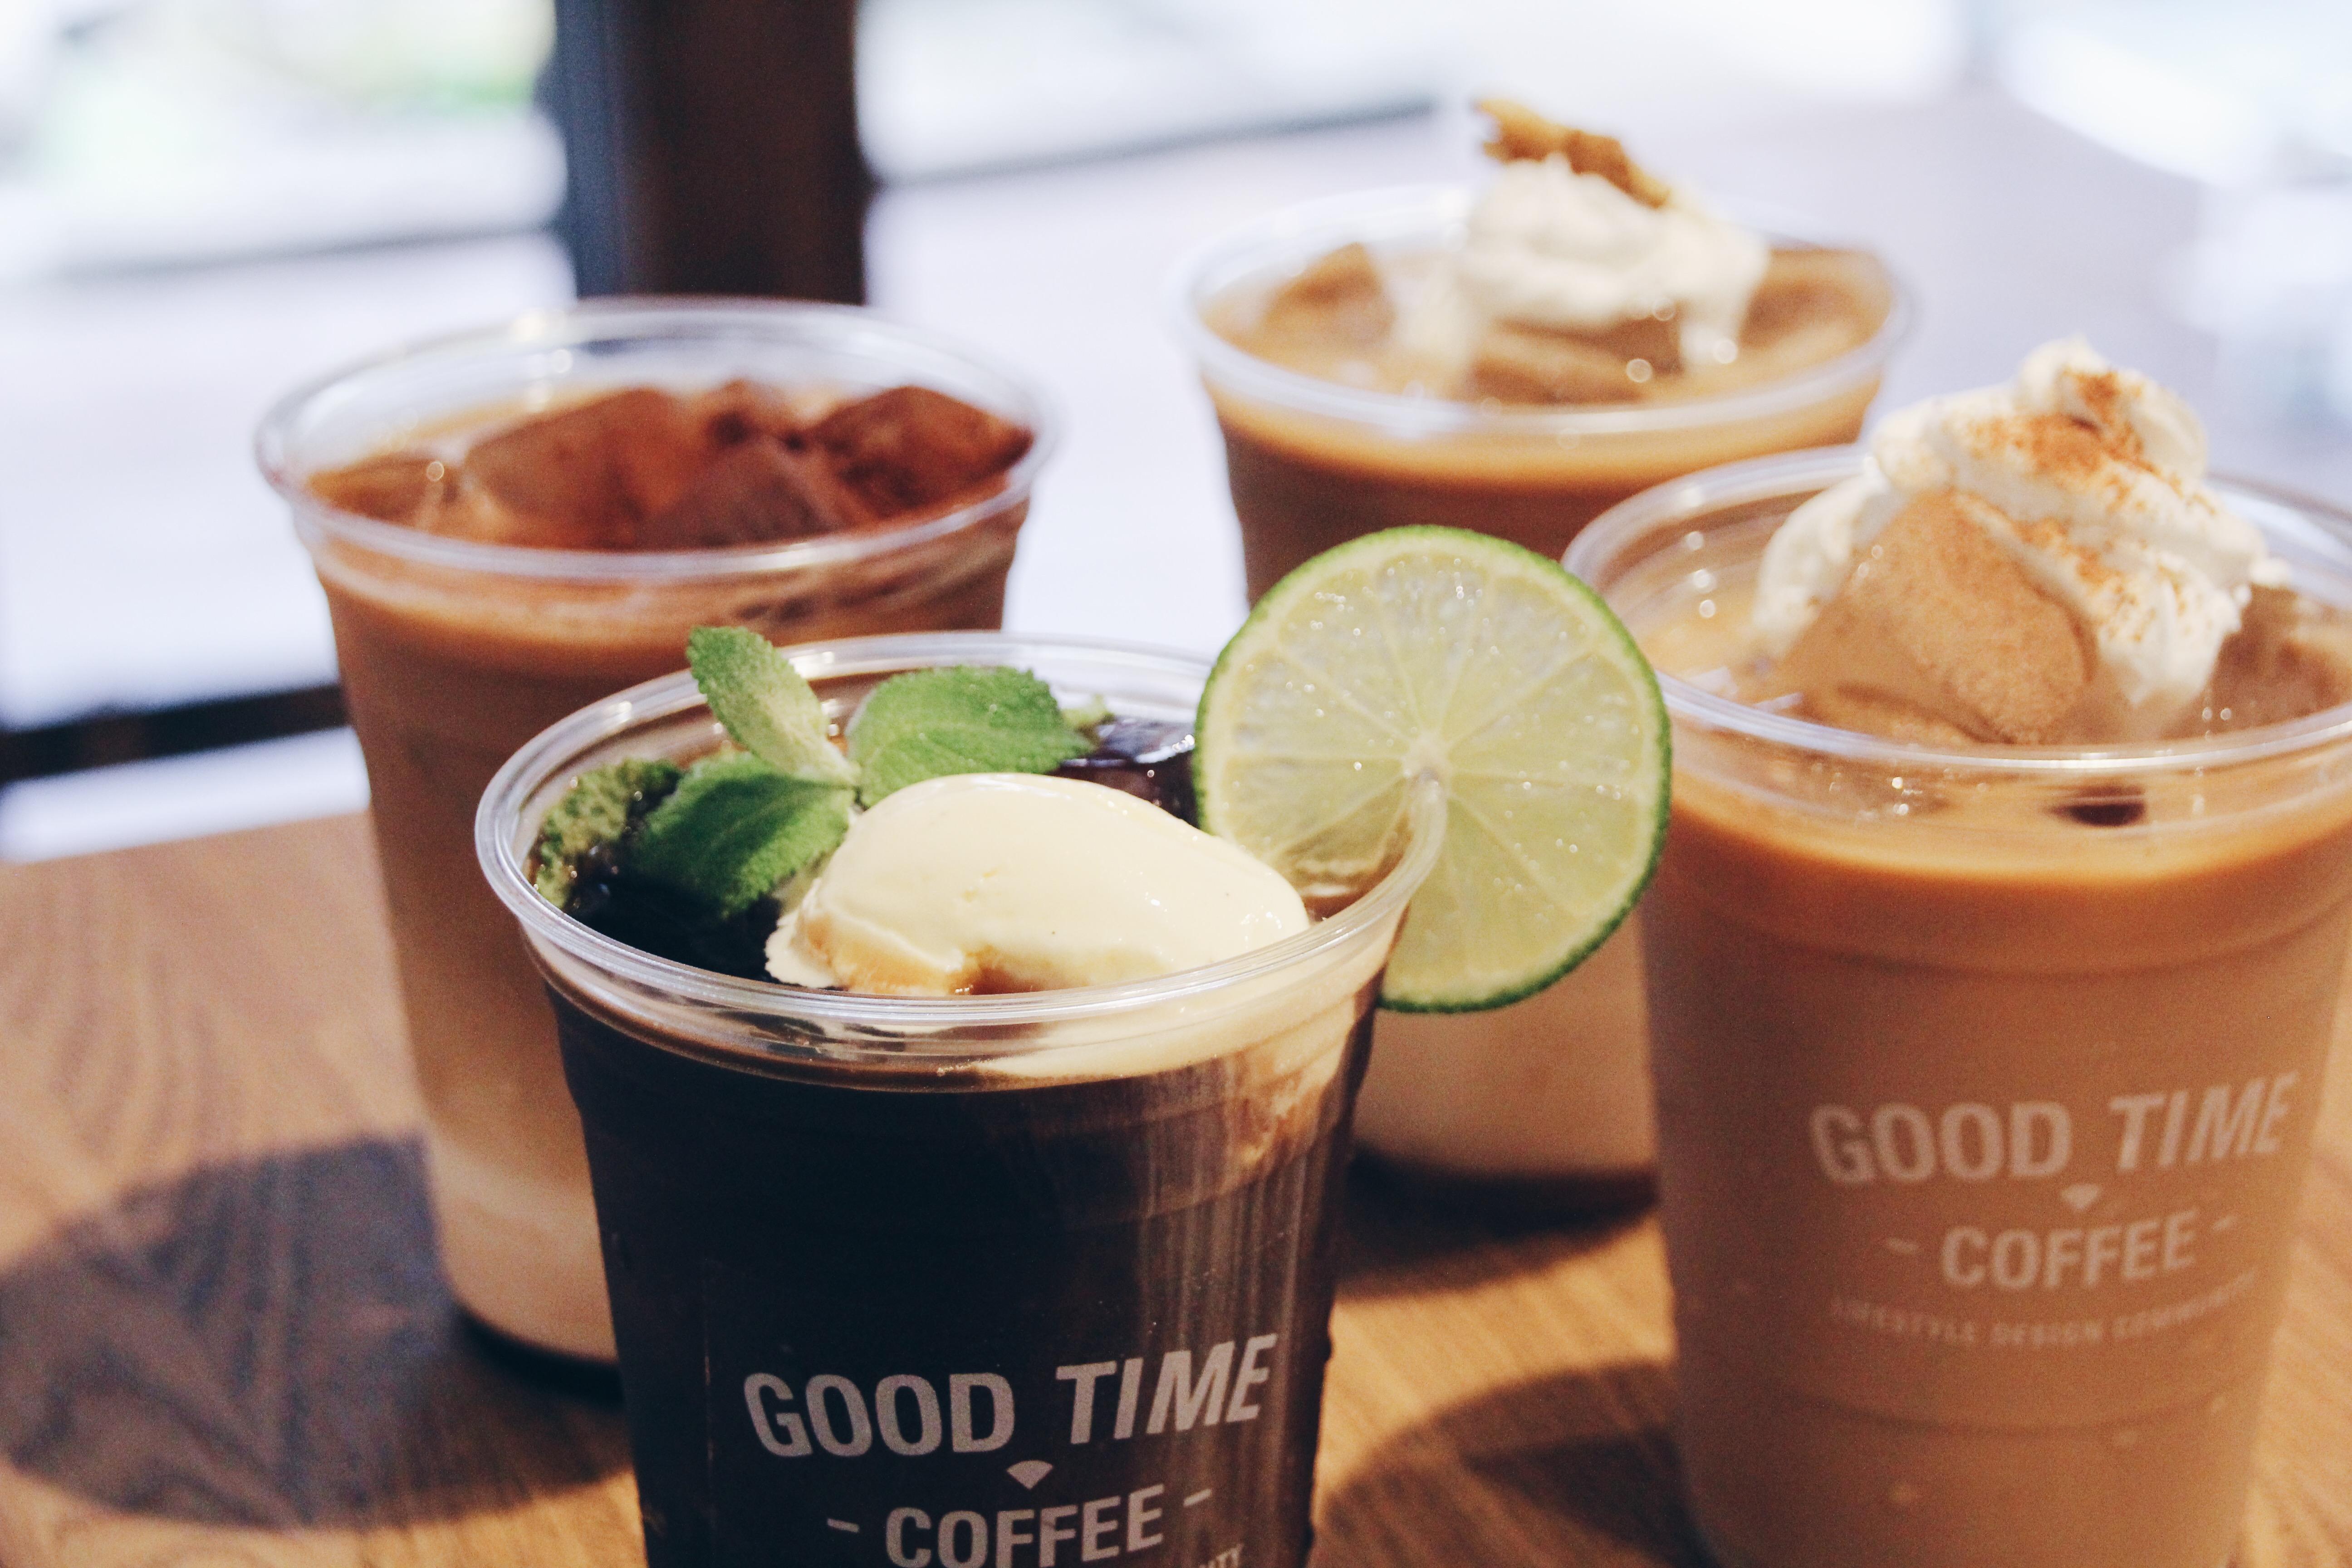 GOOD TIME COFFEE WORKSHOP 〜アイスコーヒーで作るアレンジレシピ〜